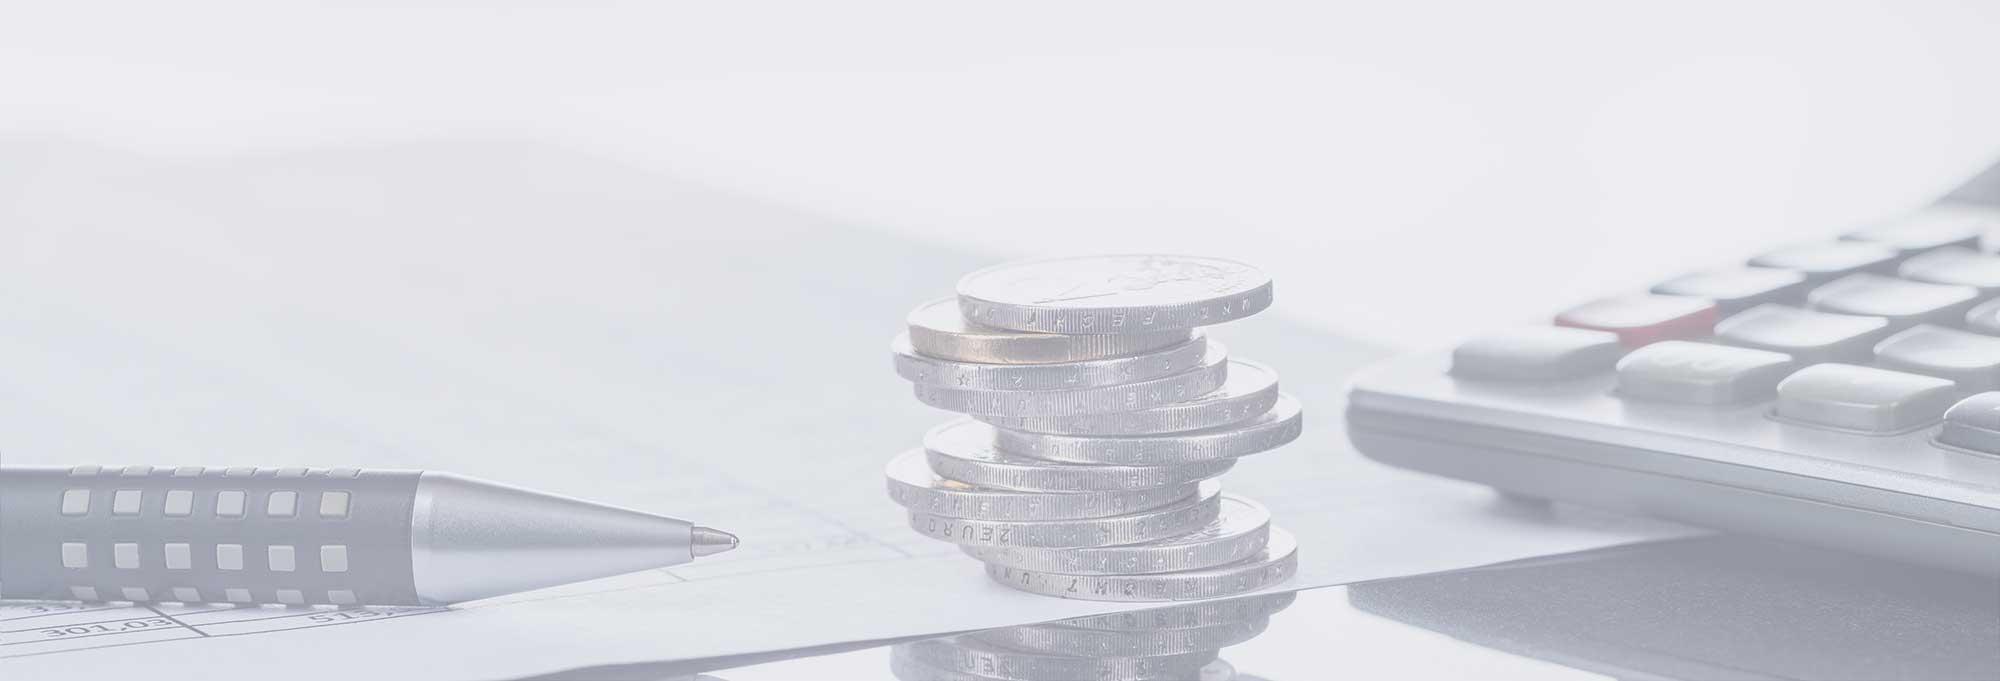 Call-to-action - Kosten Urnengemeinschaftsgrab